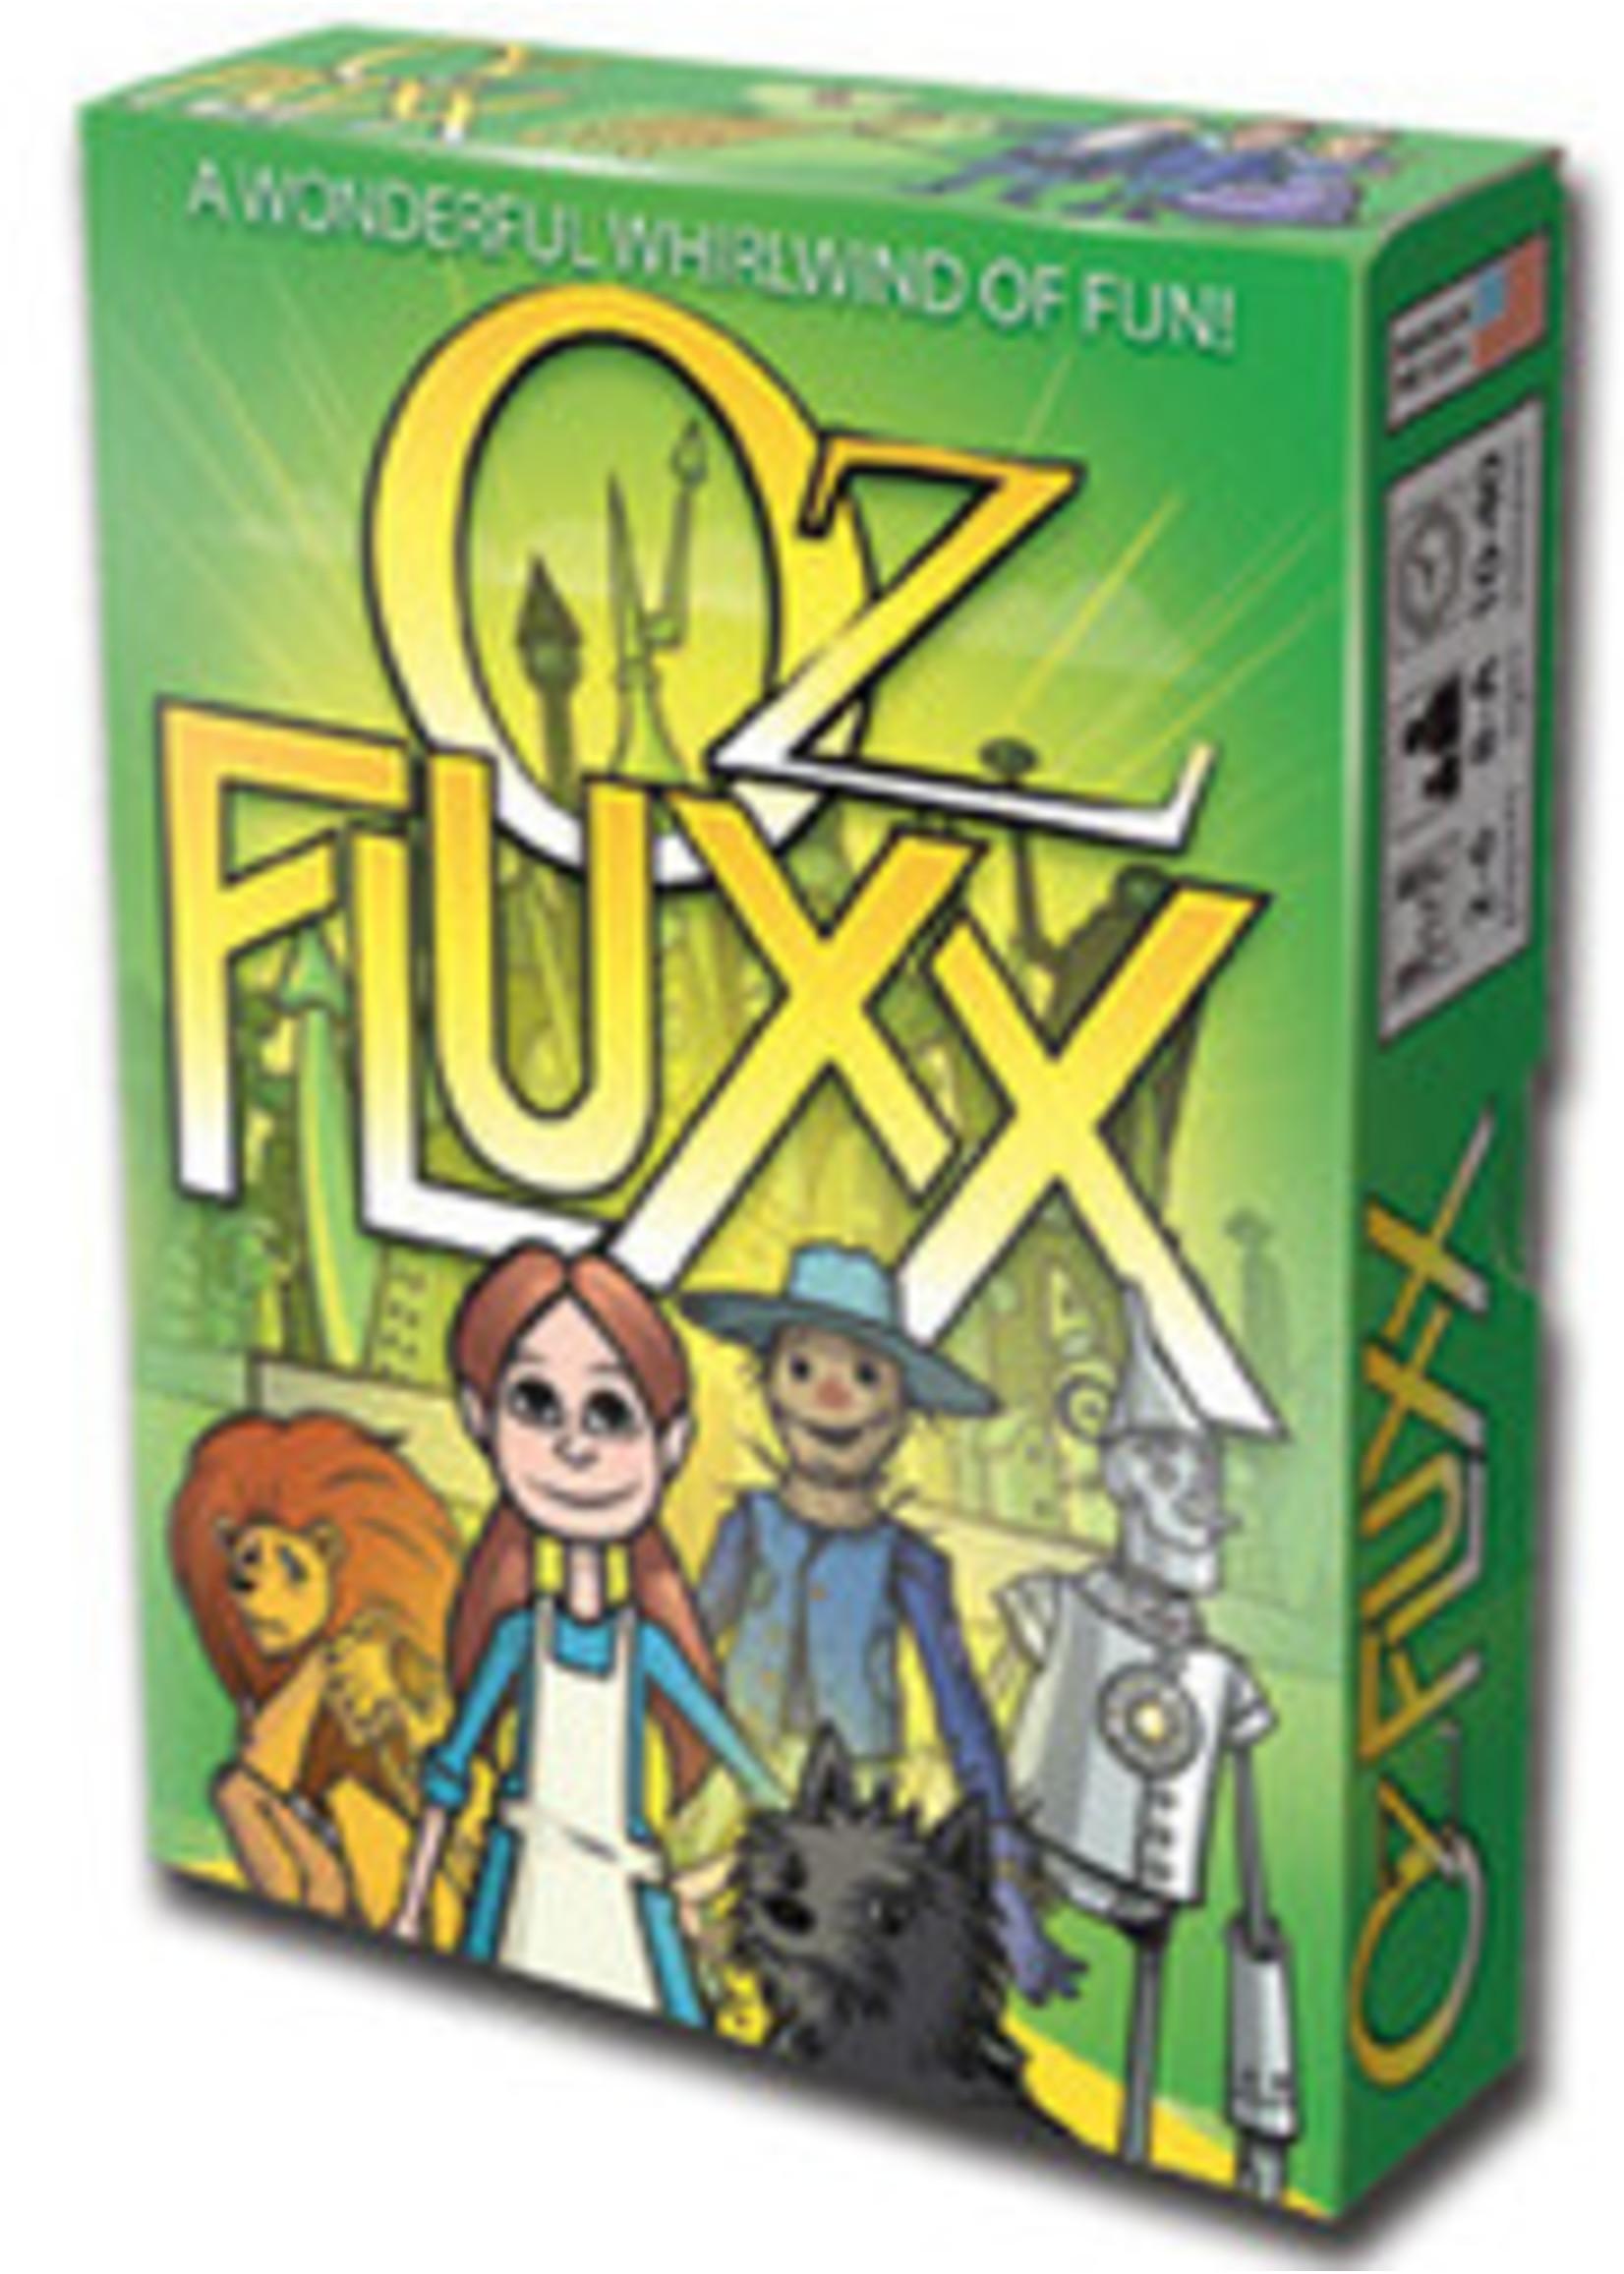 Oz Fluxx (DISPLAY 6)